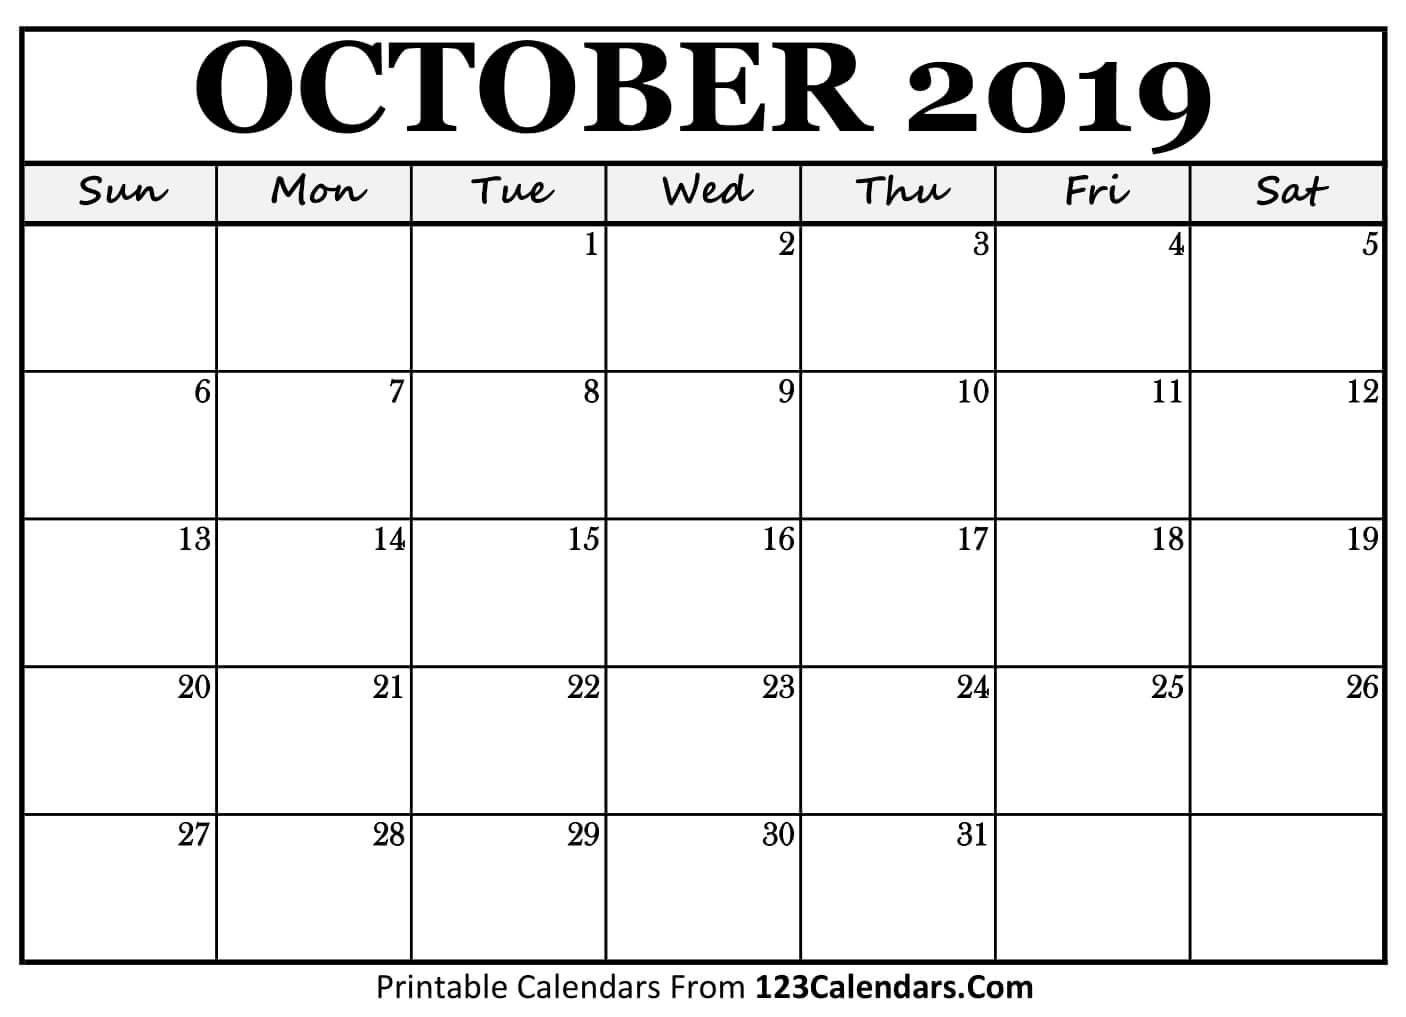 Printable October 2019 Calendar Templates - 123Calendars Calendar 2019 Oct